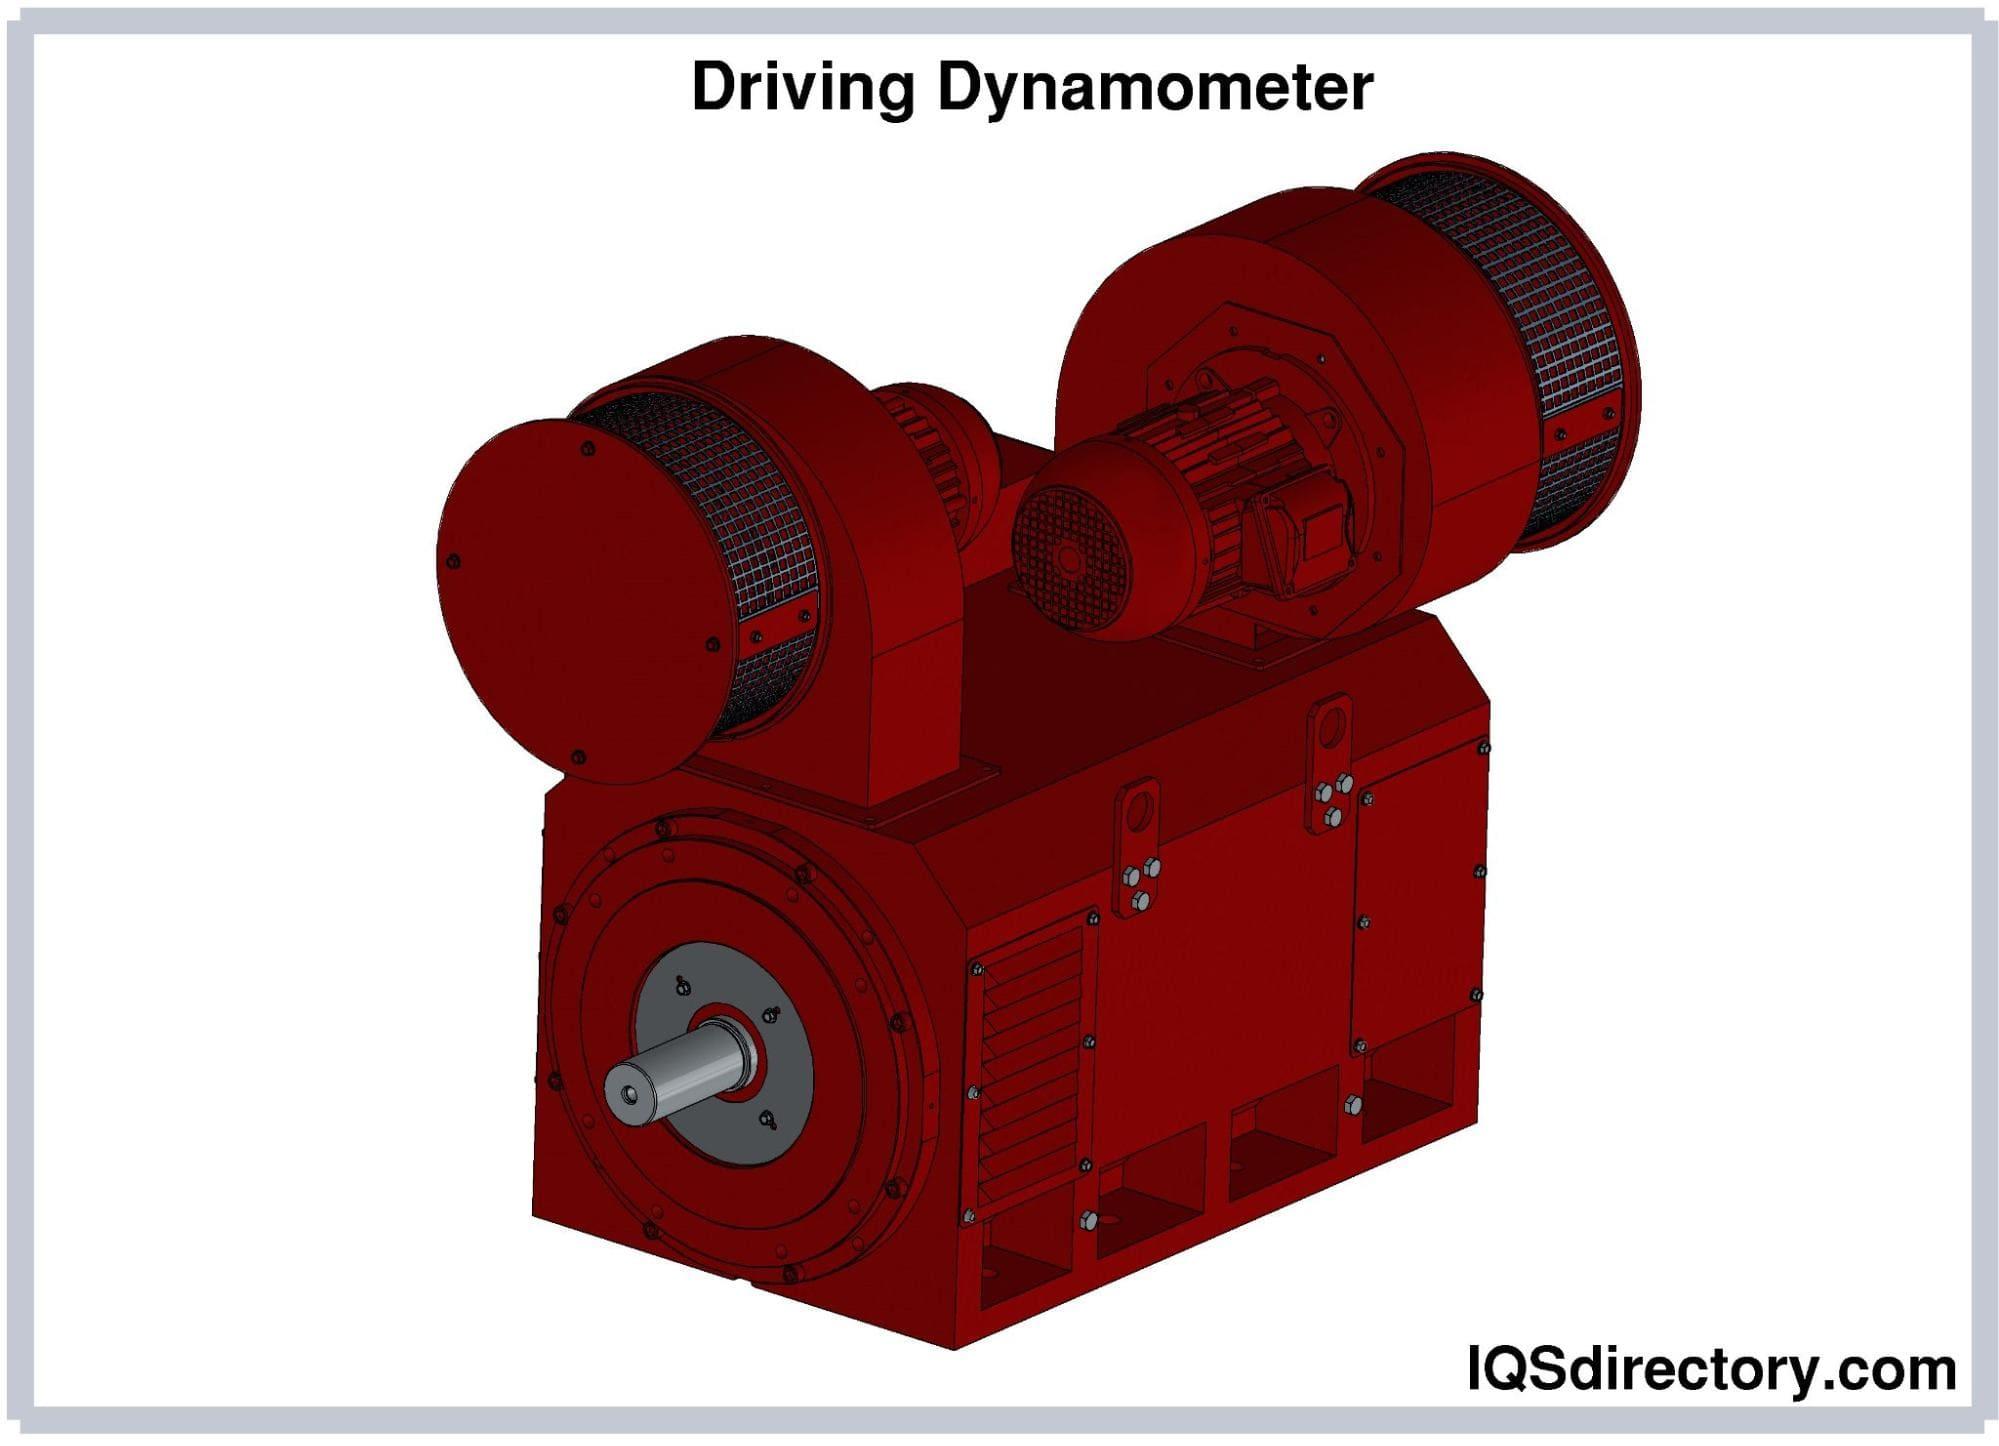 Driving Dynamometer